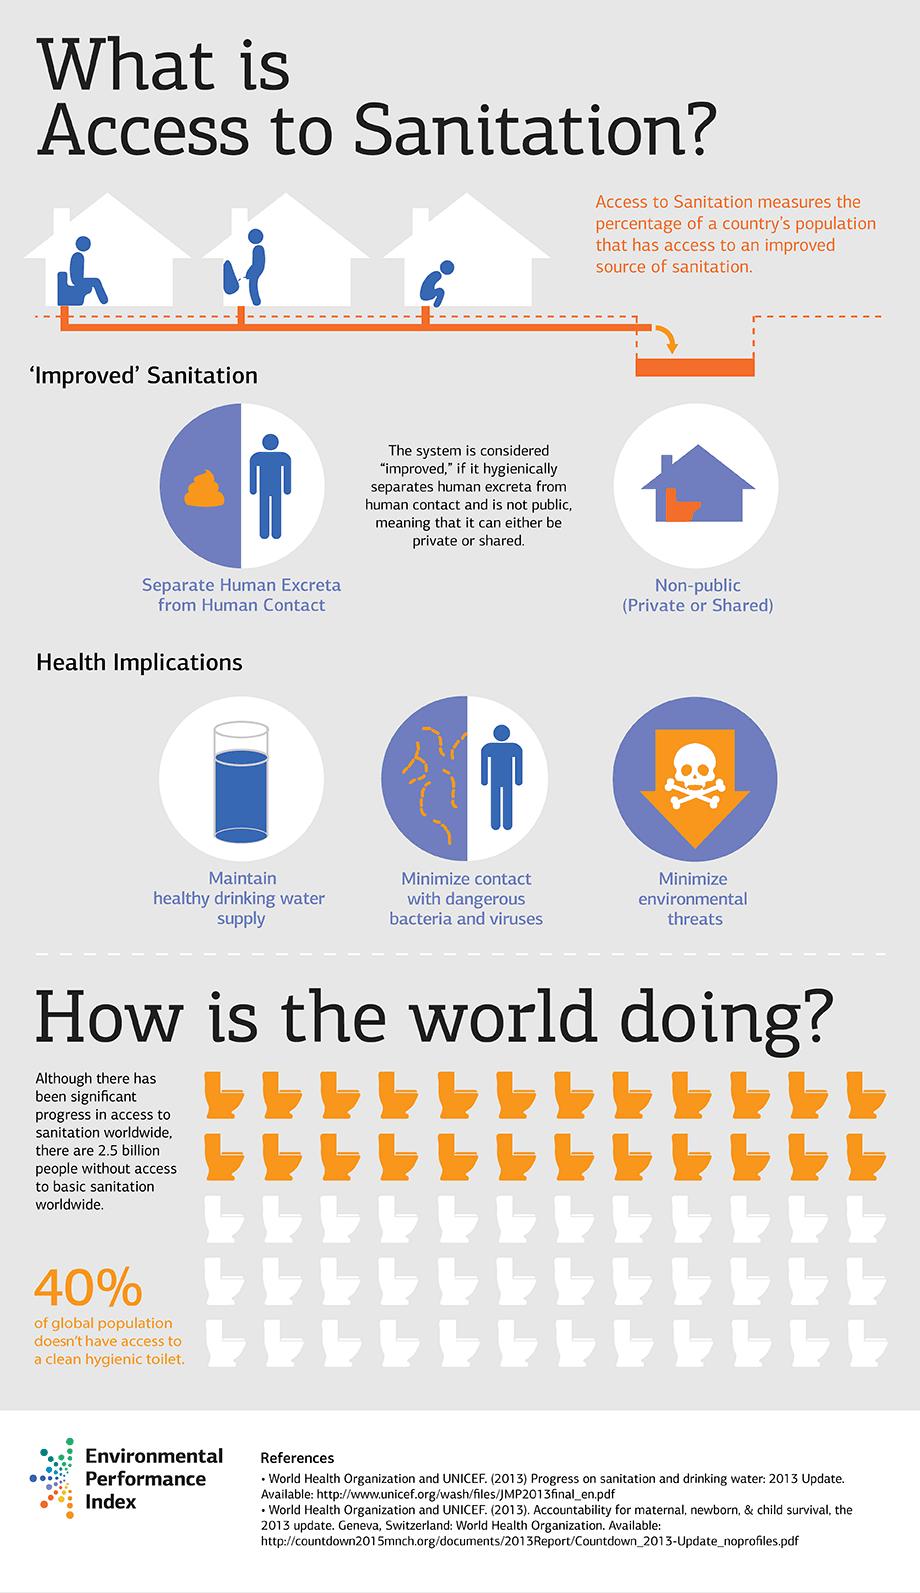 access-to-sanitation_final-01